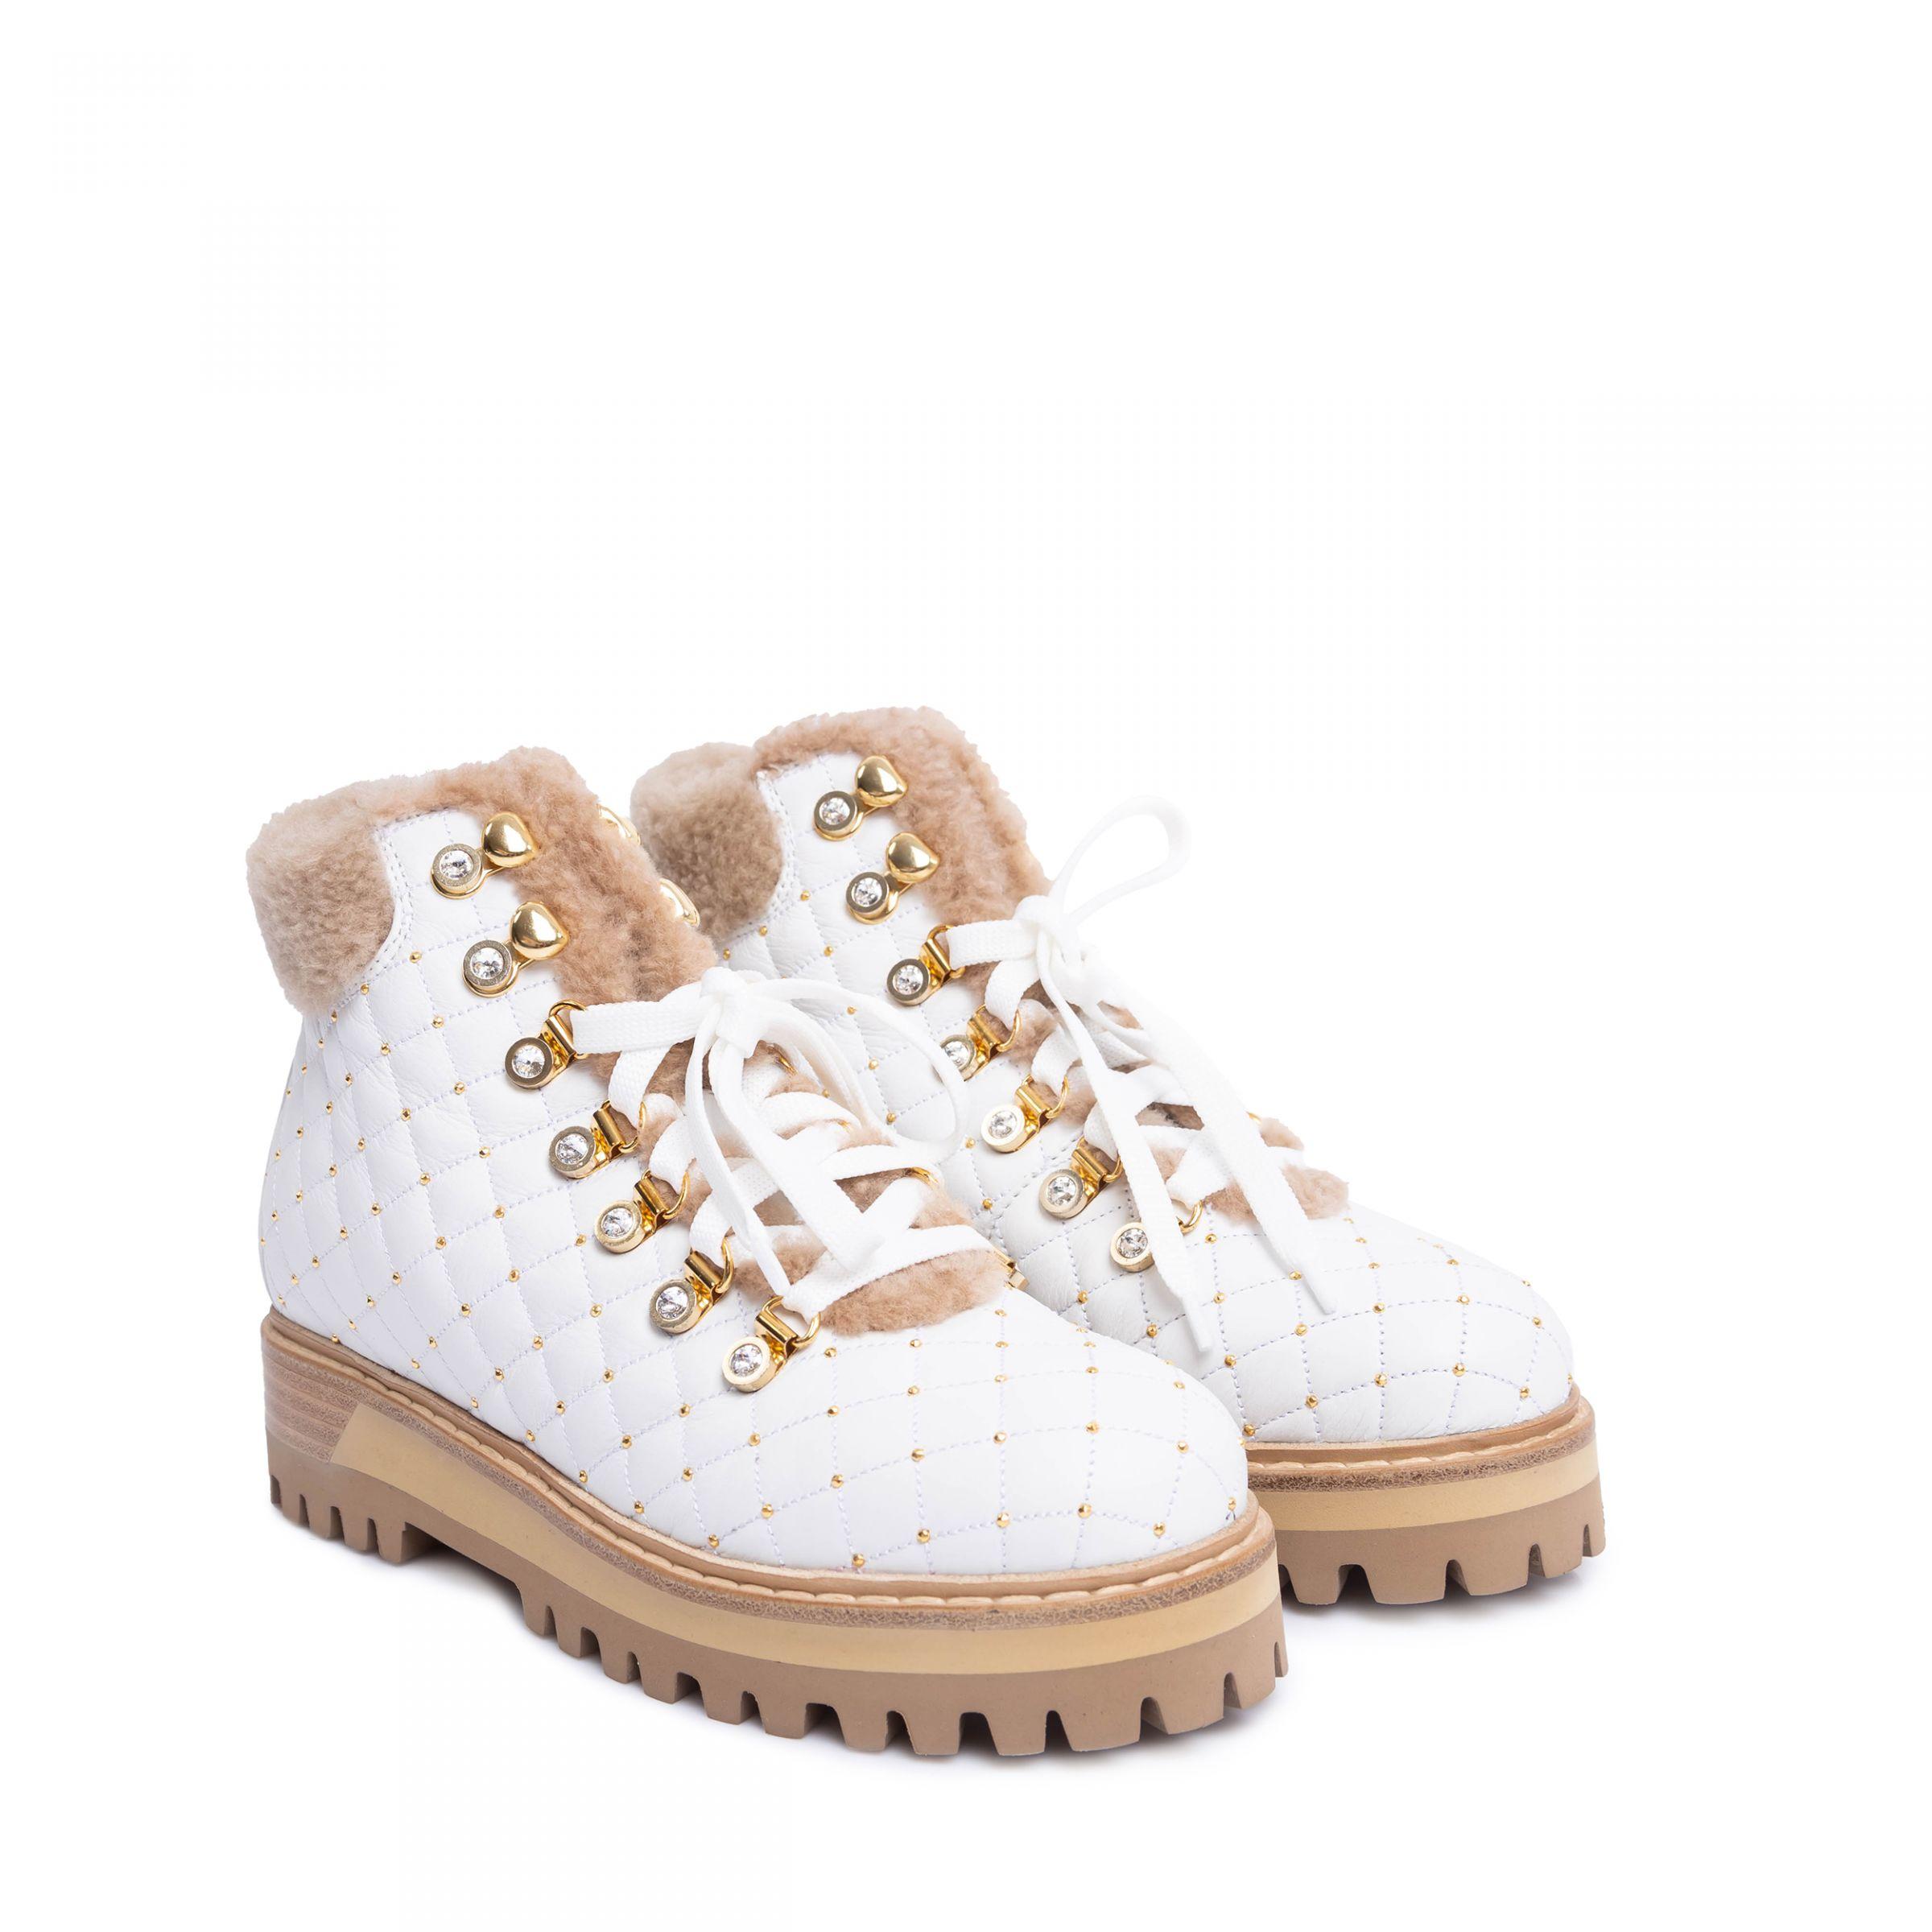 Ботинки флет на меху Le Silla белые